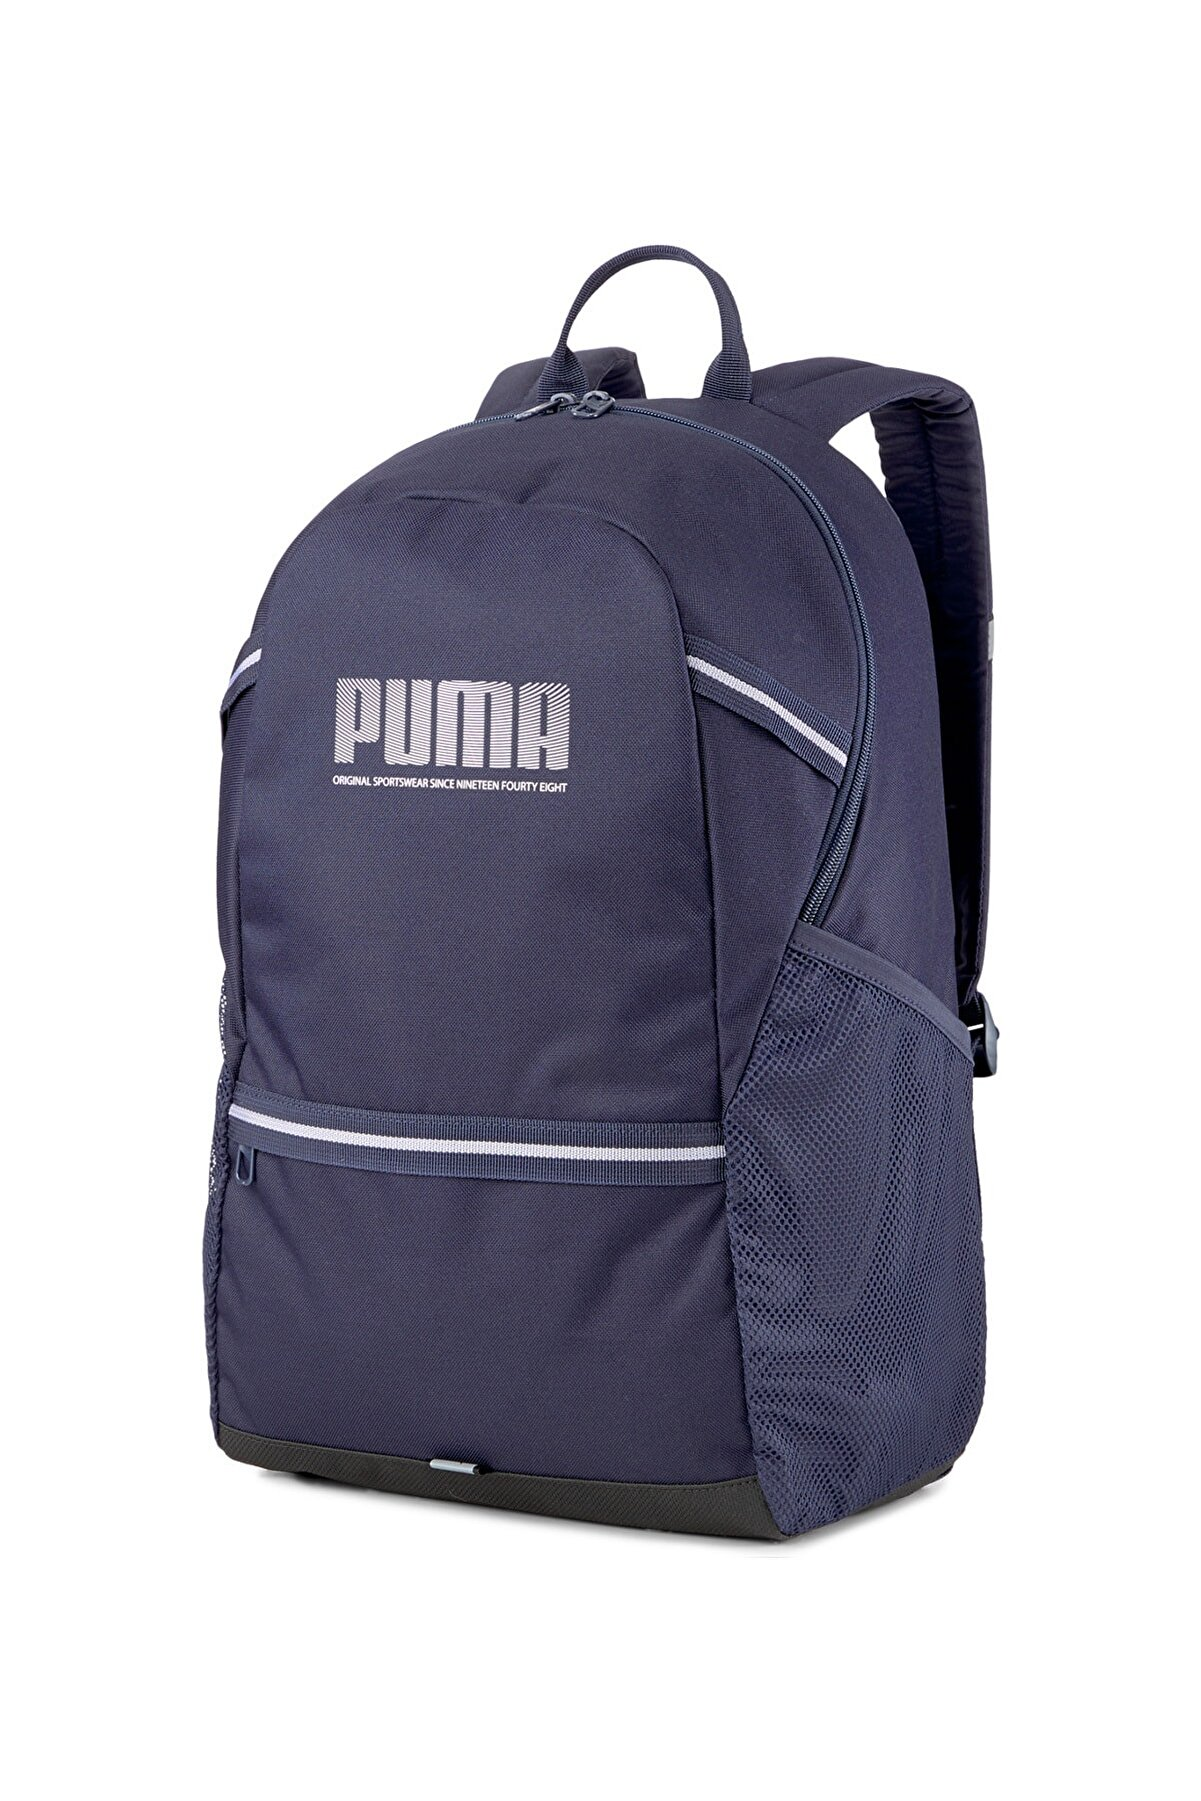 Puma PLUS BACKPACK PEACOA Lacivert Erkek Sırt Çantası 101085609